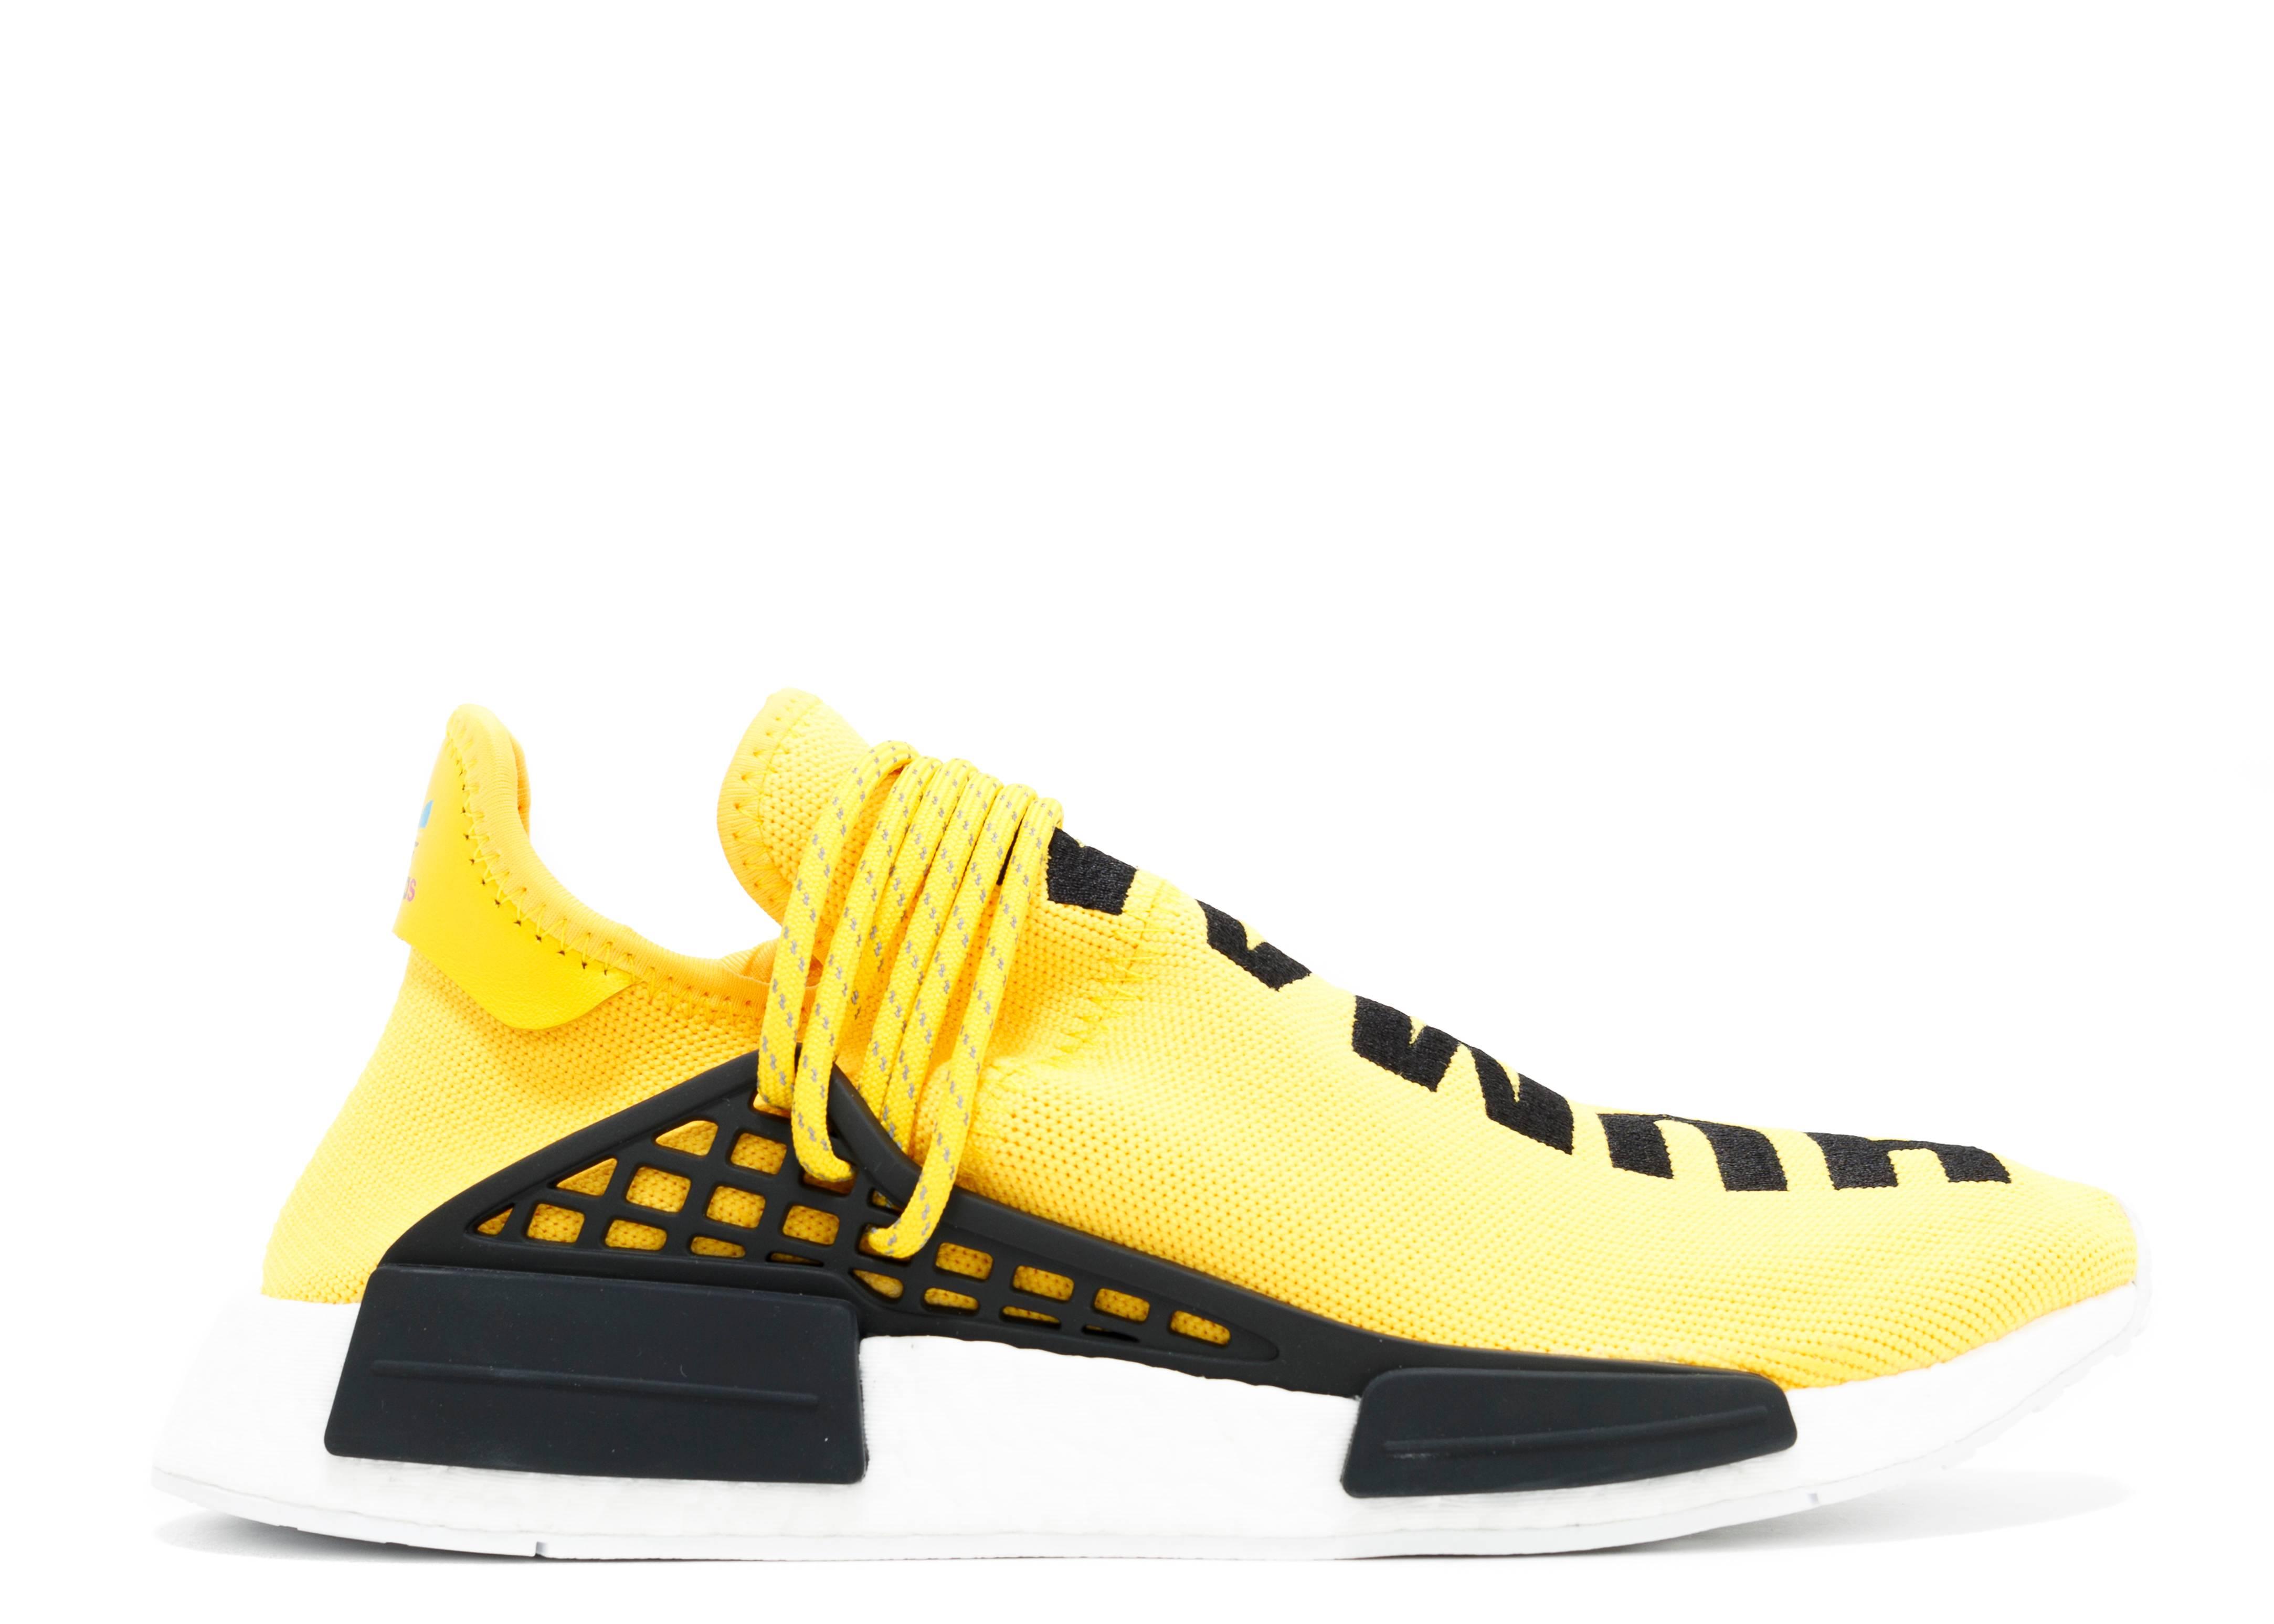 Pharrell Williams X Adidas NMD Human Race Green YC1298